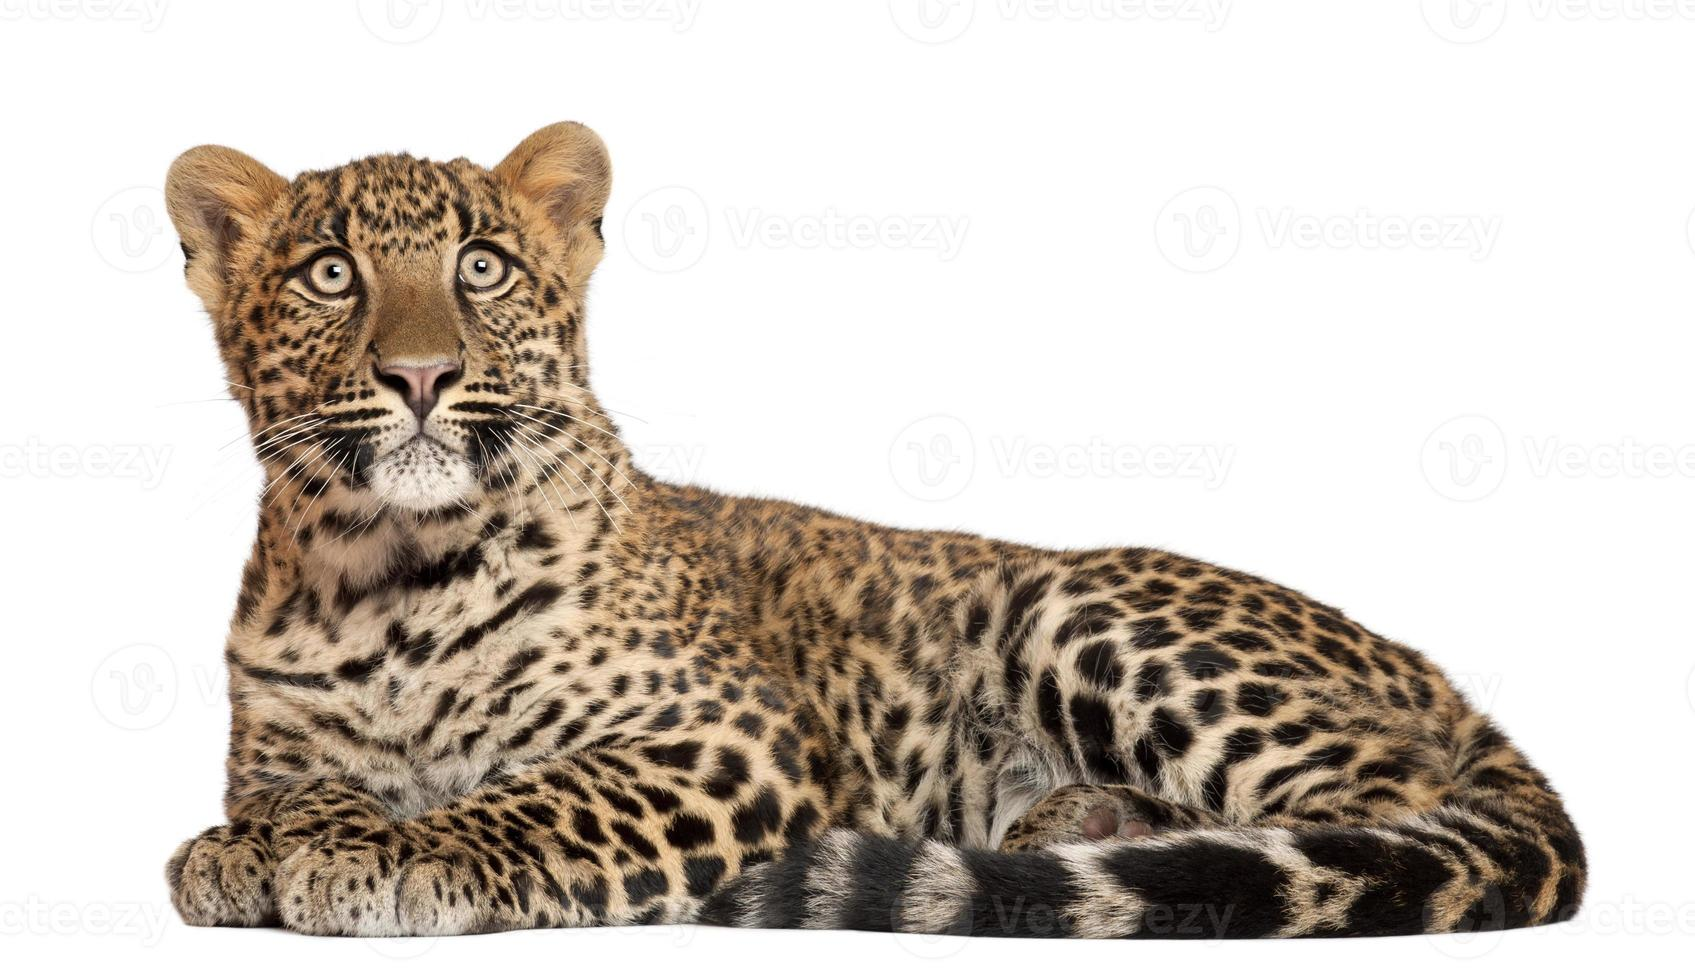 luipaard, panthera pardus isoltaed liggend op wit foto